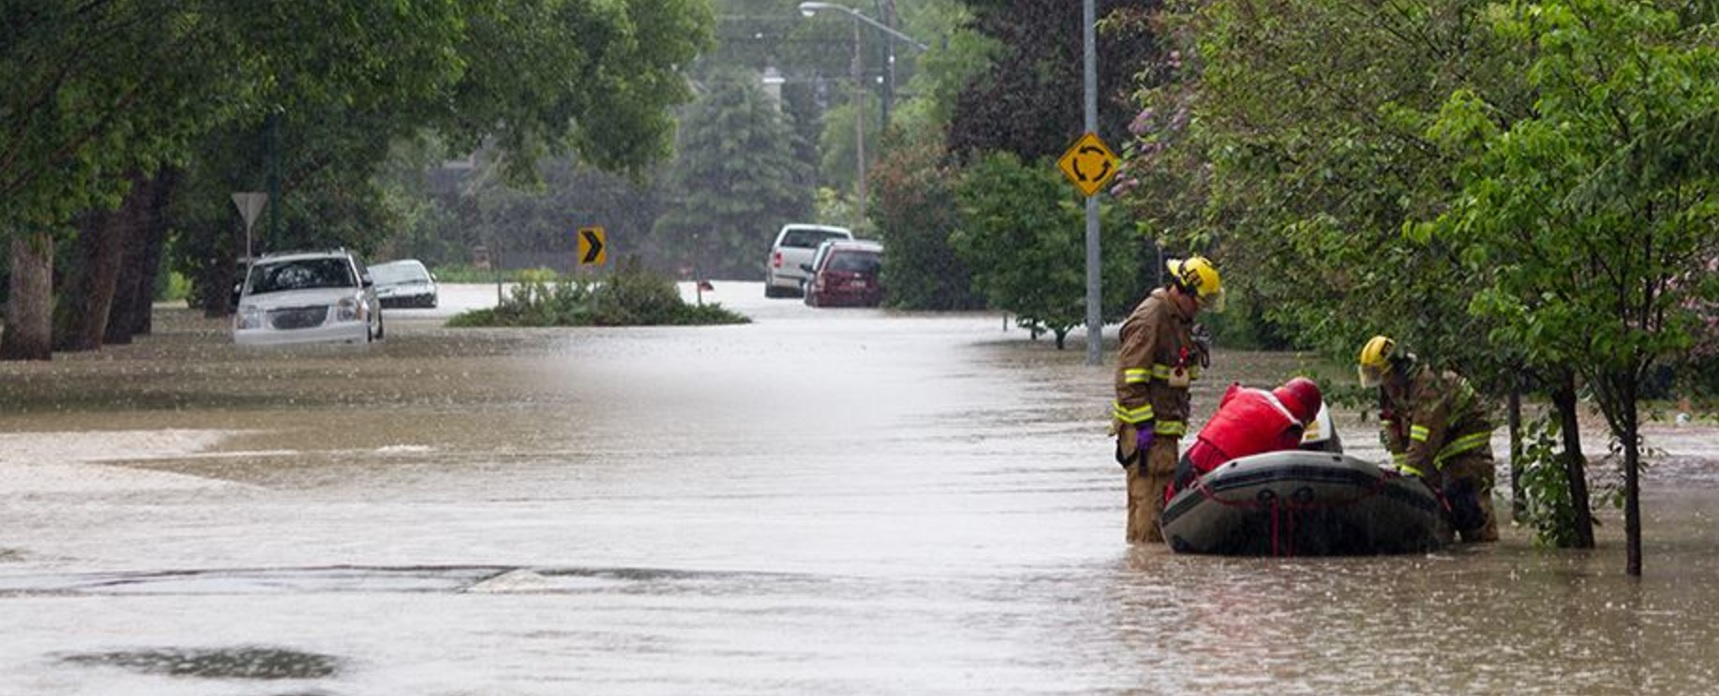 Harvey Flooded Street